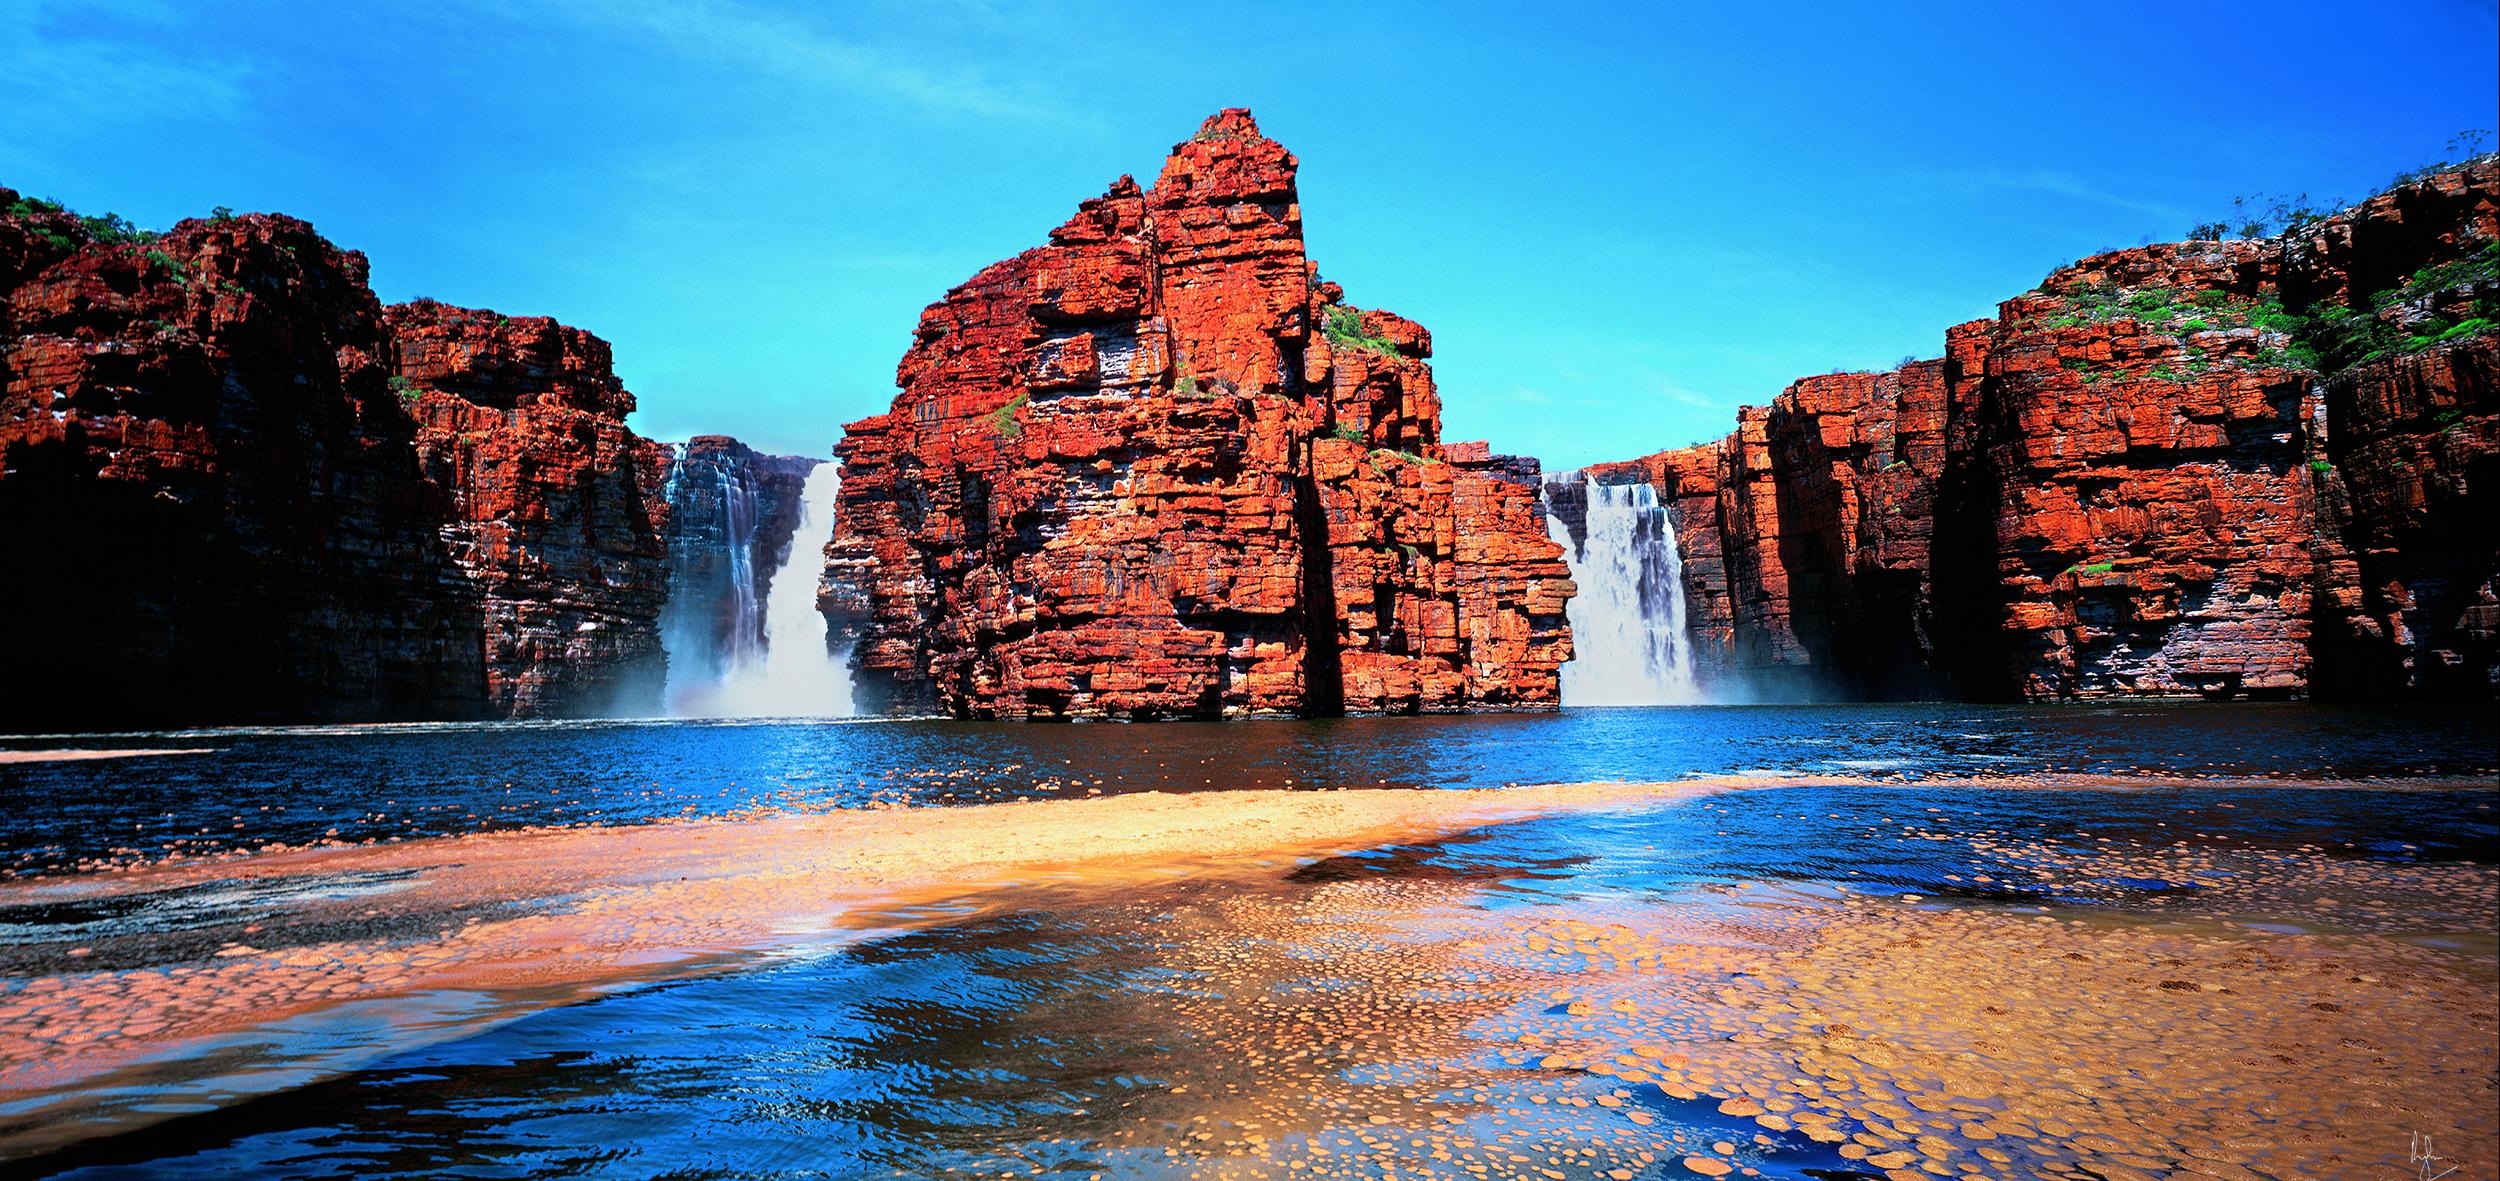 King George Falls, Kimberley, Western Australia, 2005. Edition of 250.